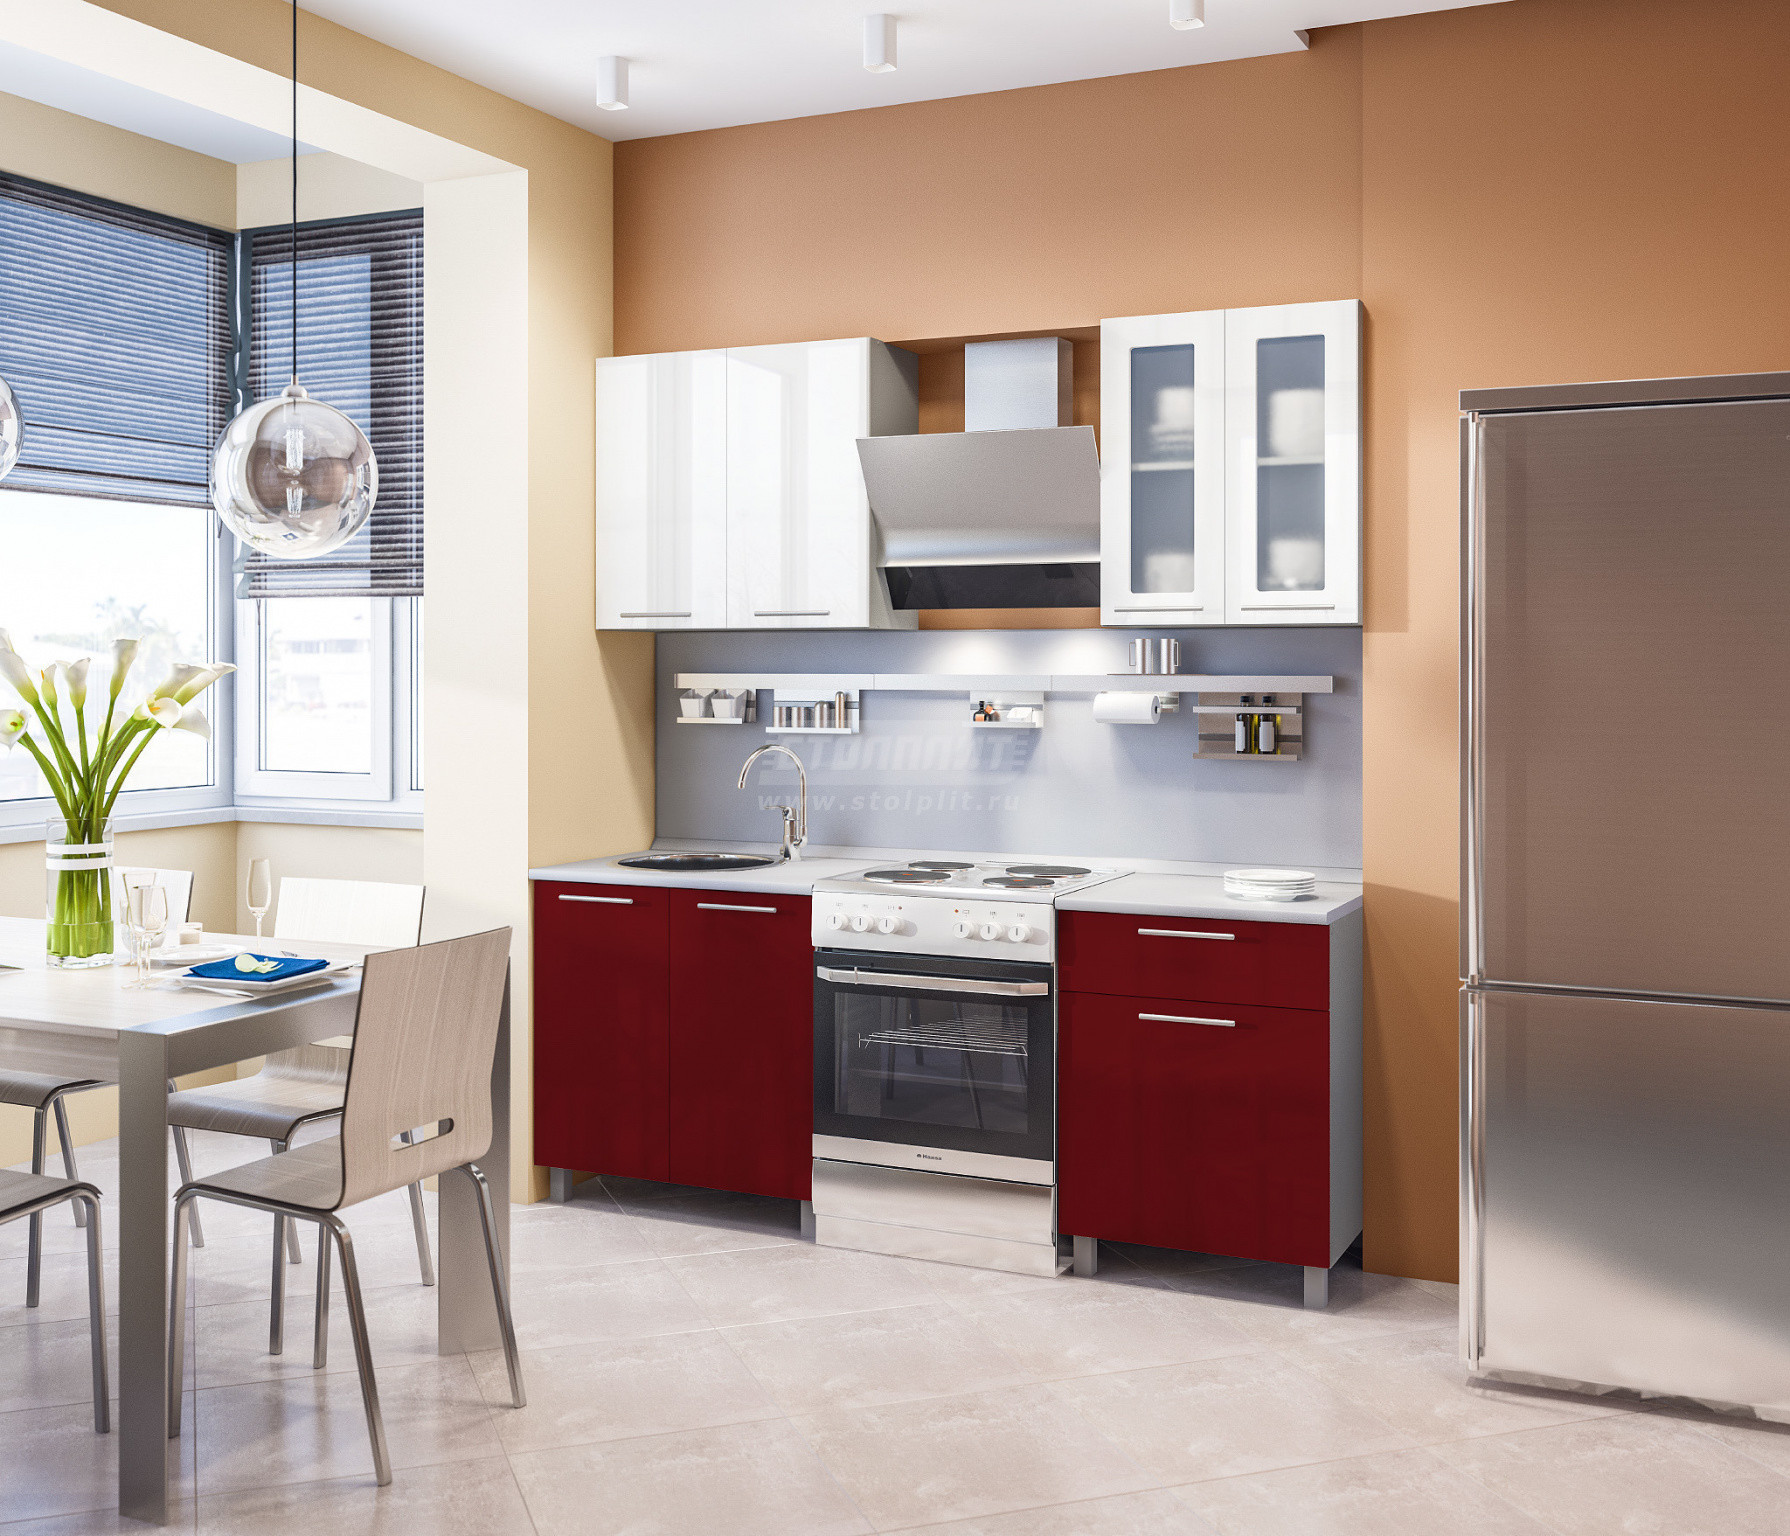 Кухня Столплит Анна L-2000 алюминий/белый глянец/рубин глянец 140x214x60 см